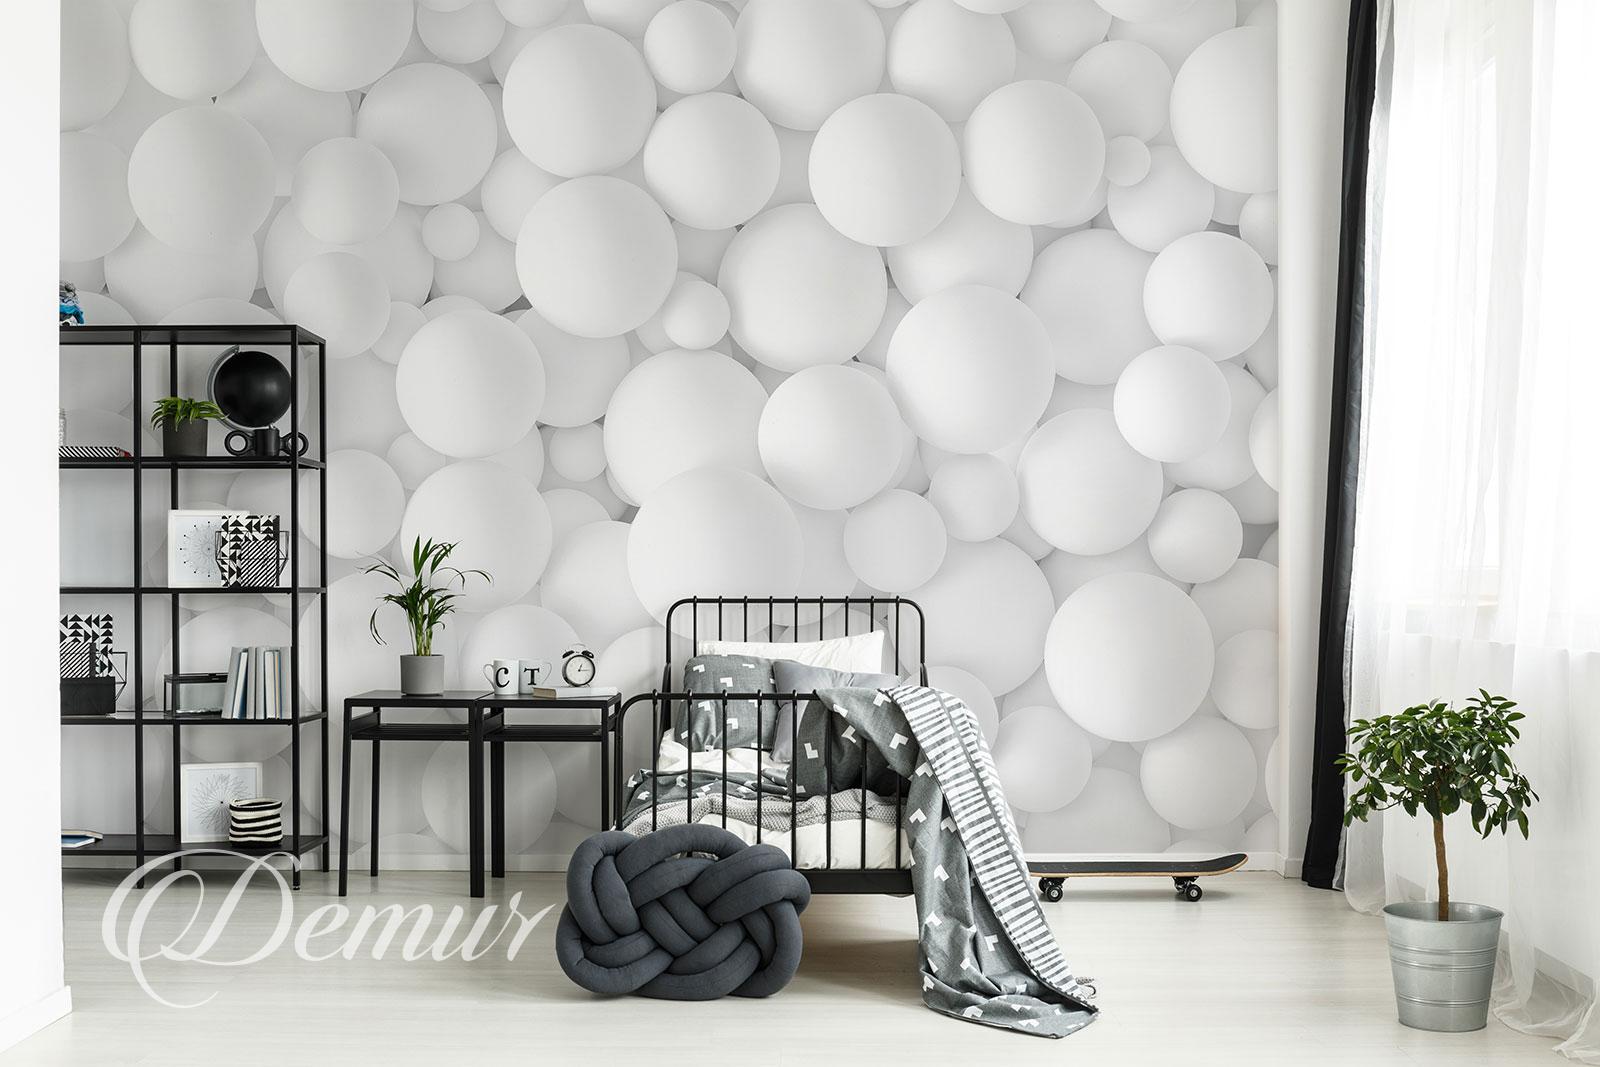 Fototapeta kule 3D - Aranżacja pokoju nastolatka - Demur